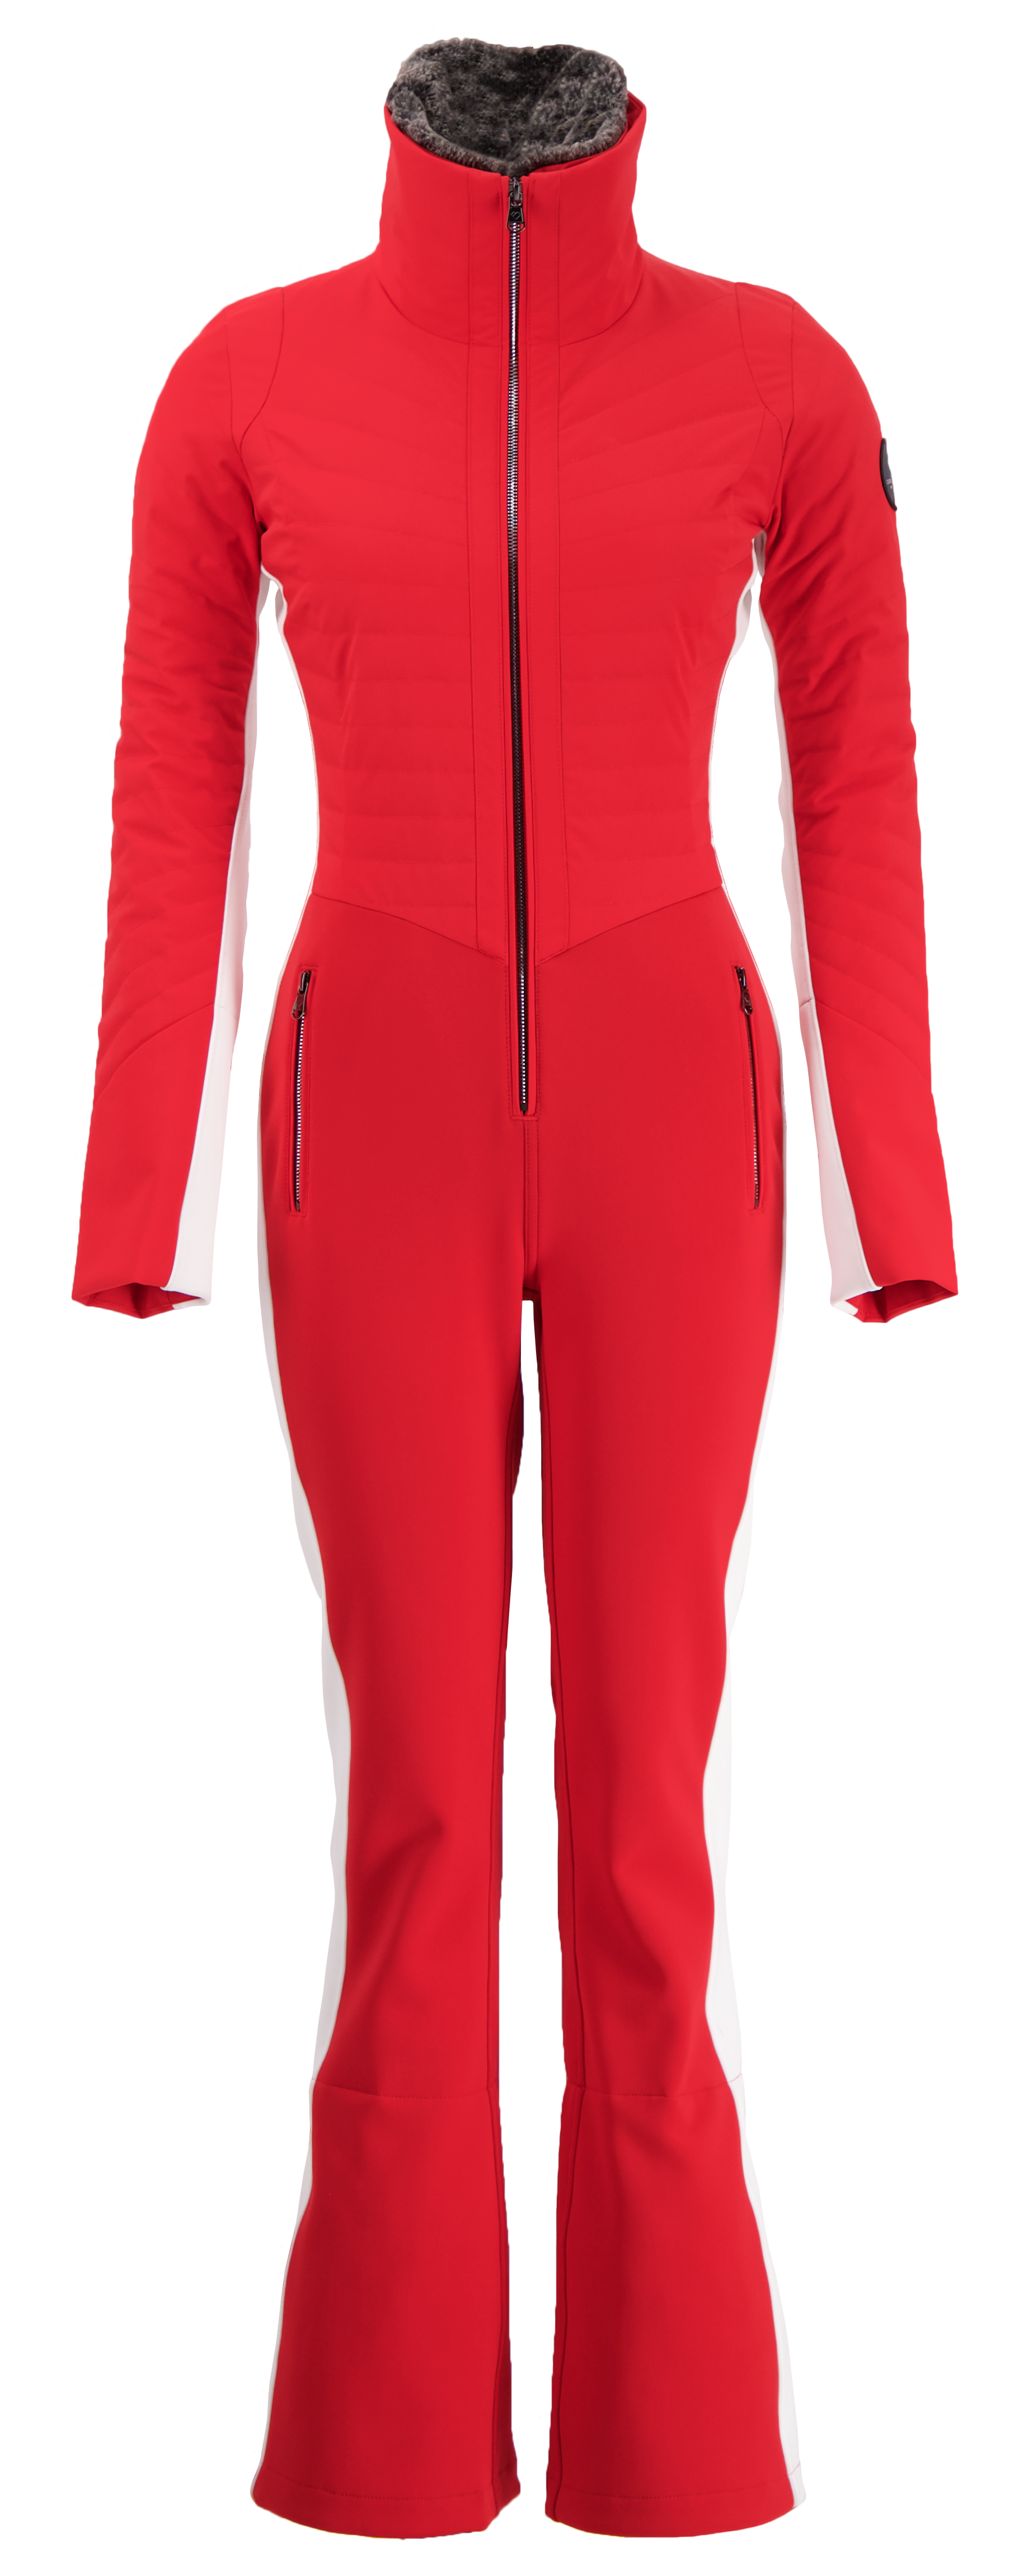 northstar biathlon